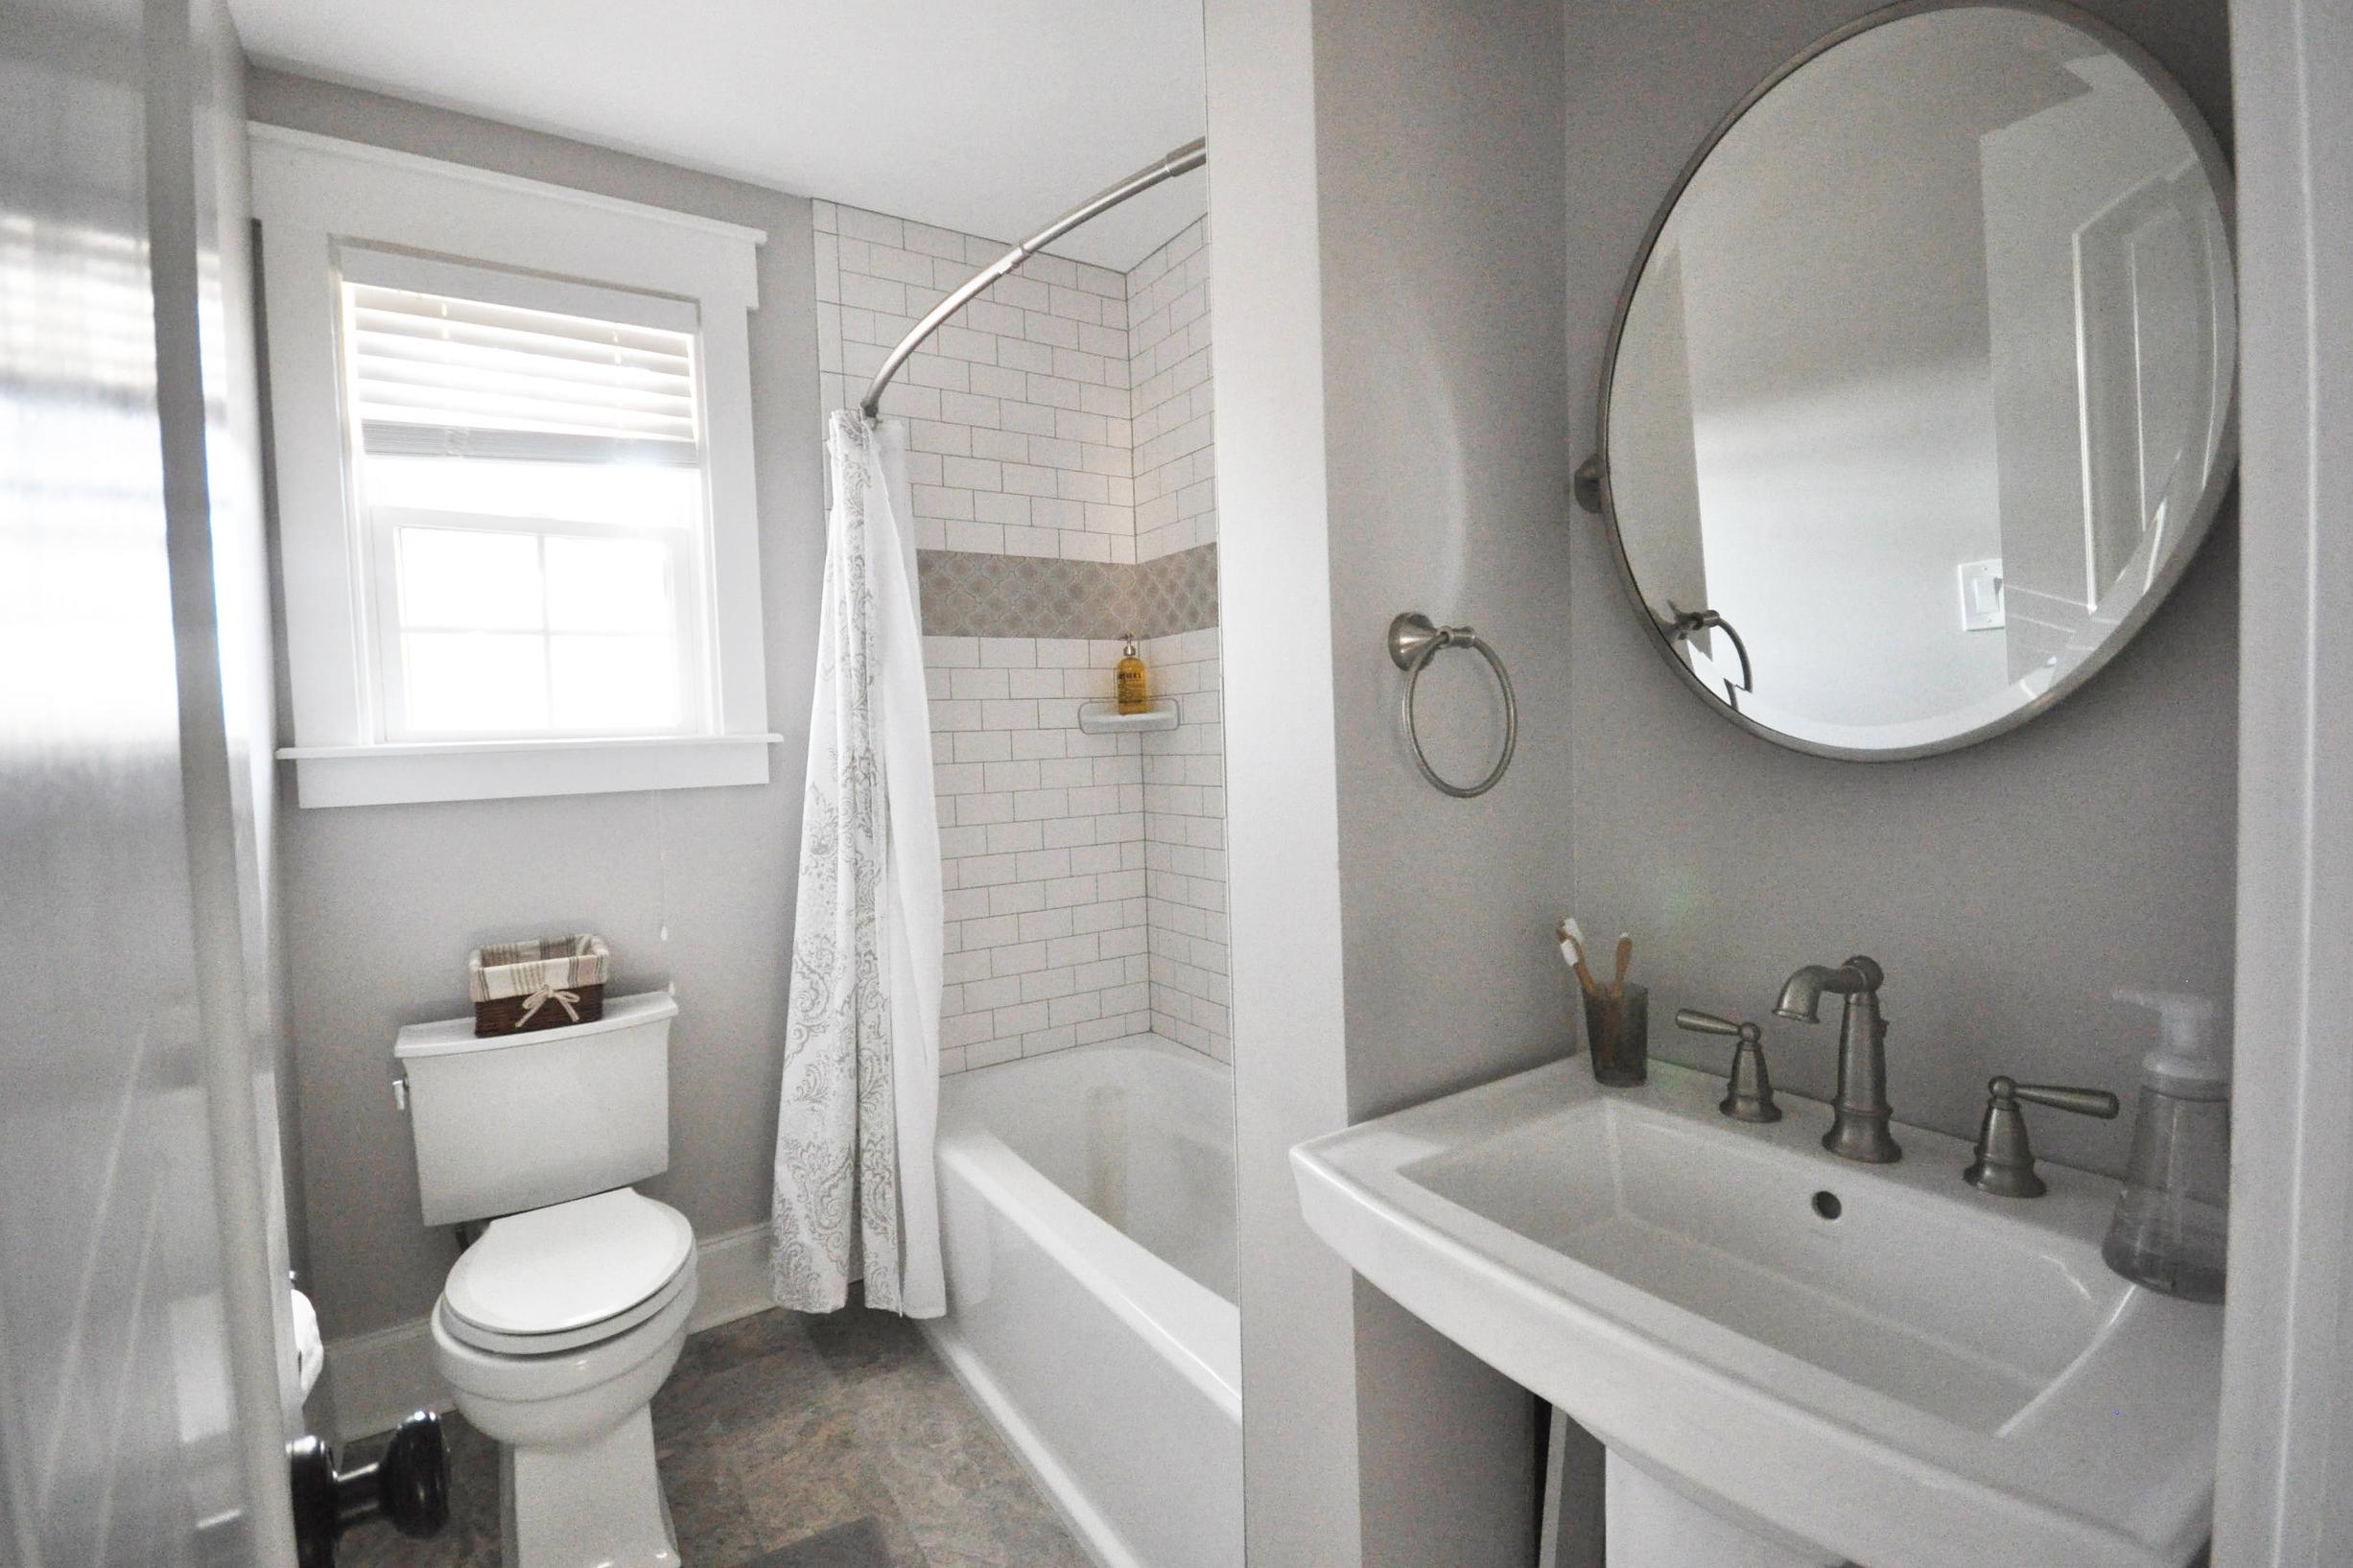 Bathroom remodel subway tile